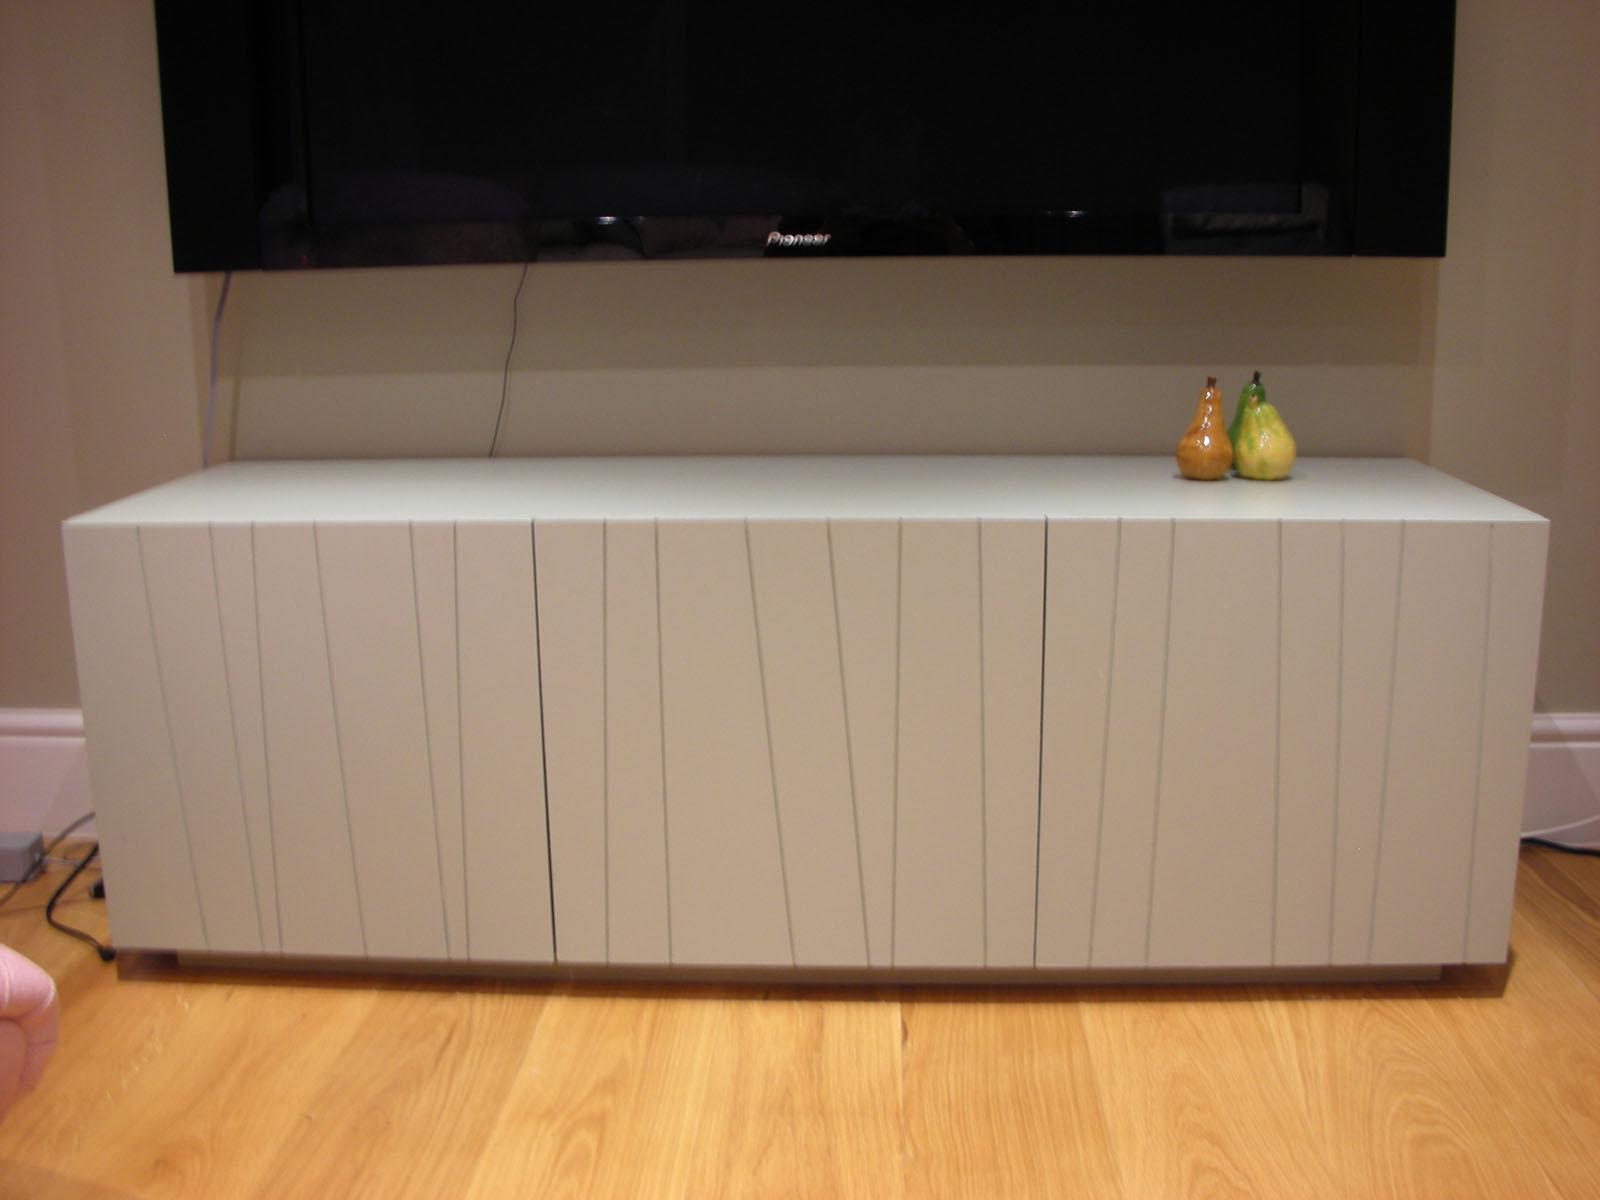 Bespoke free-standing TV storage unit